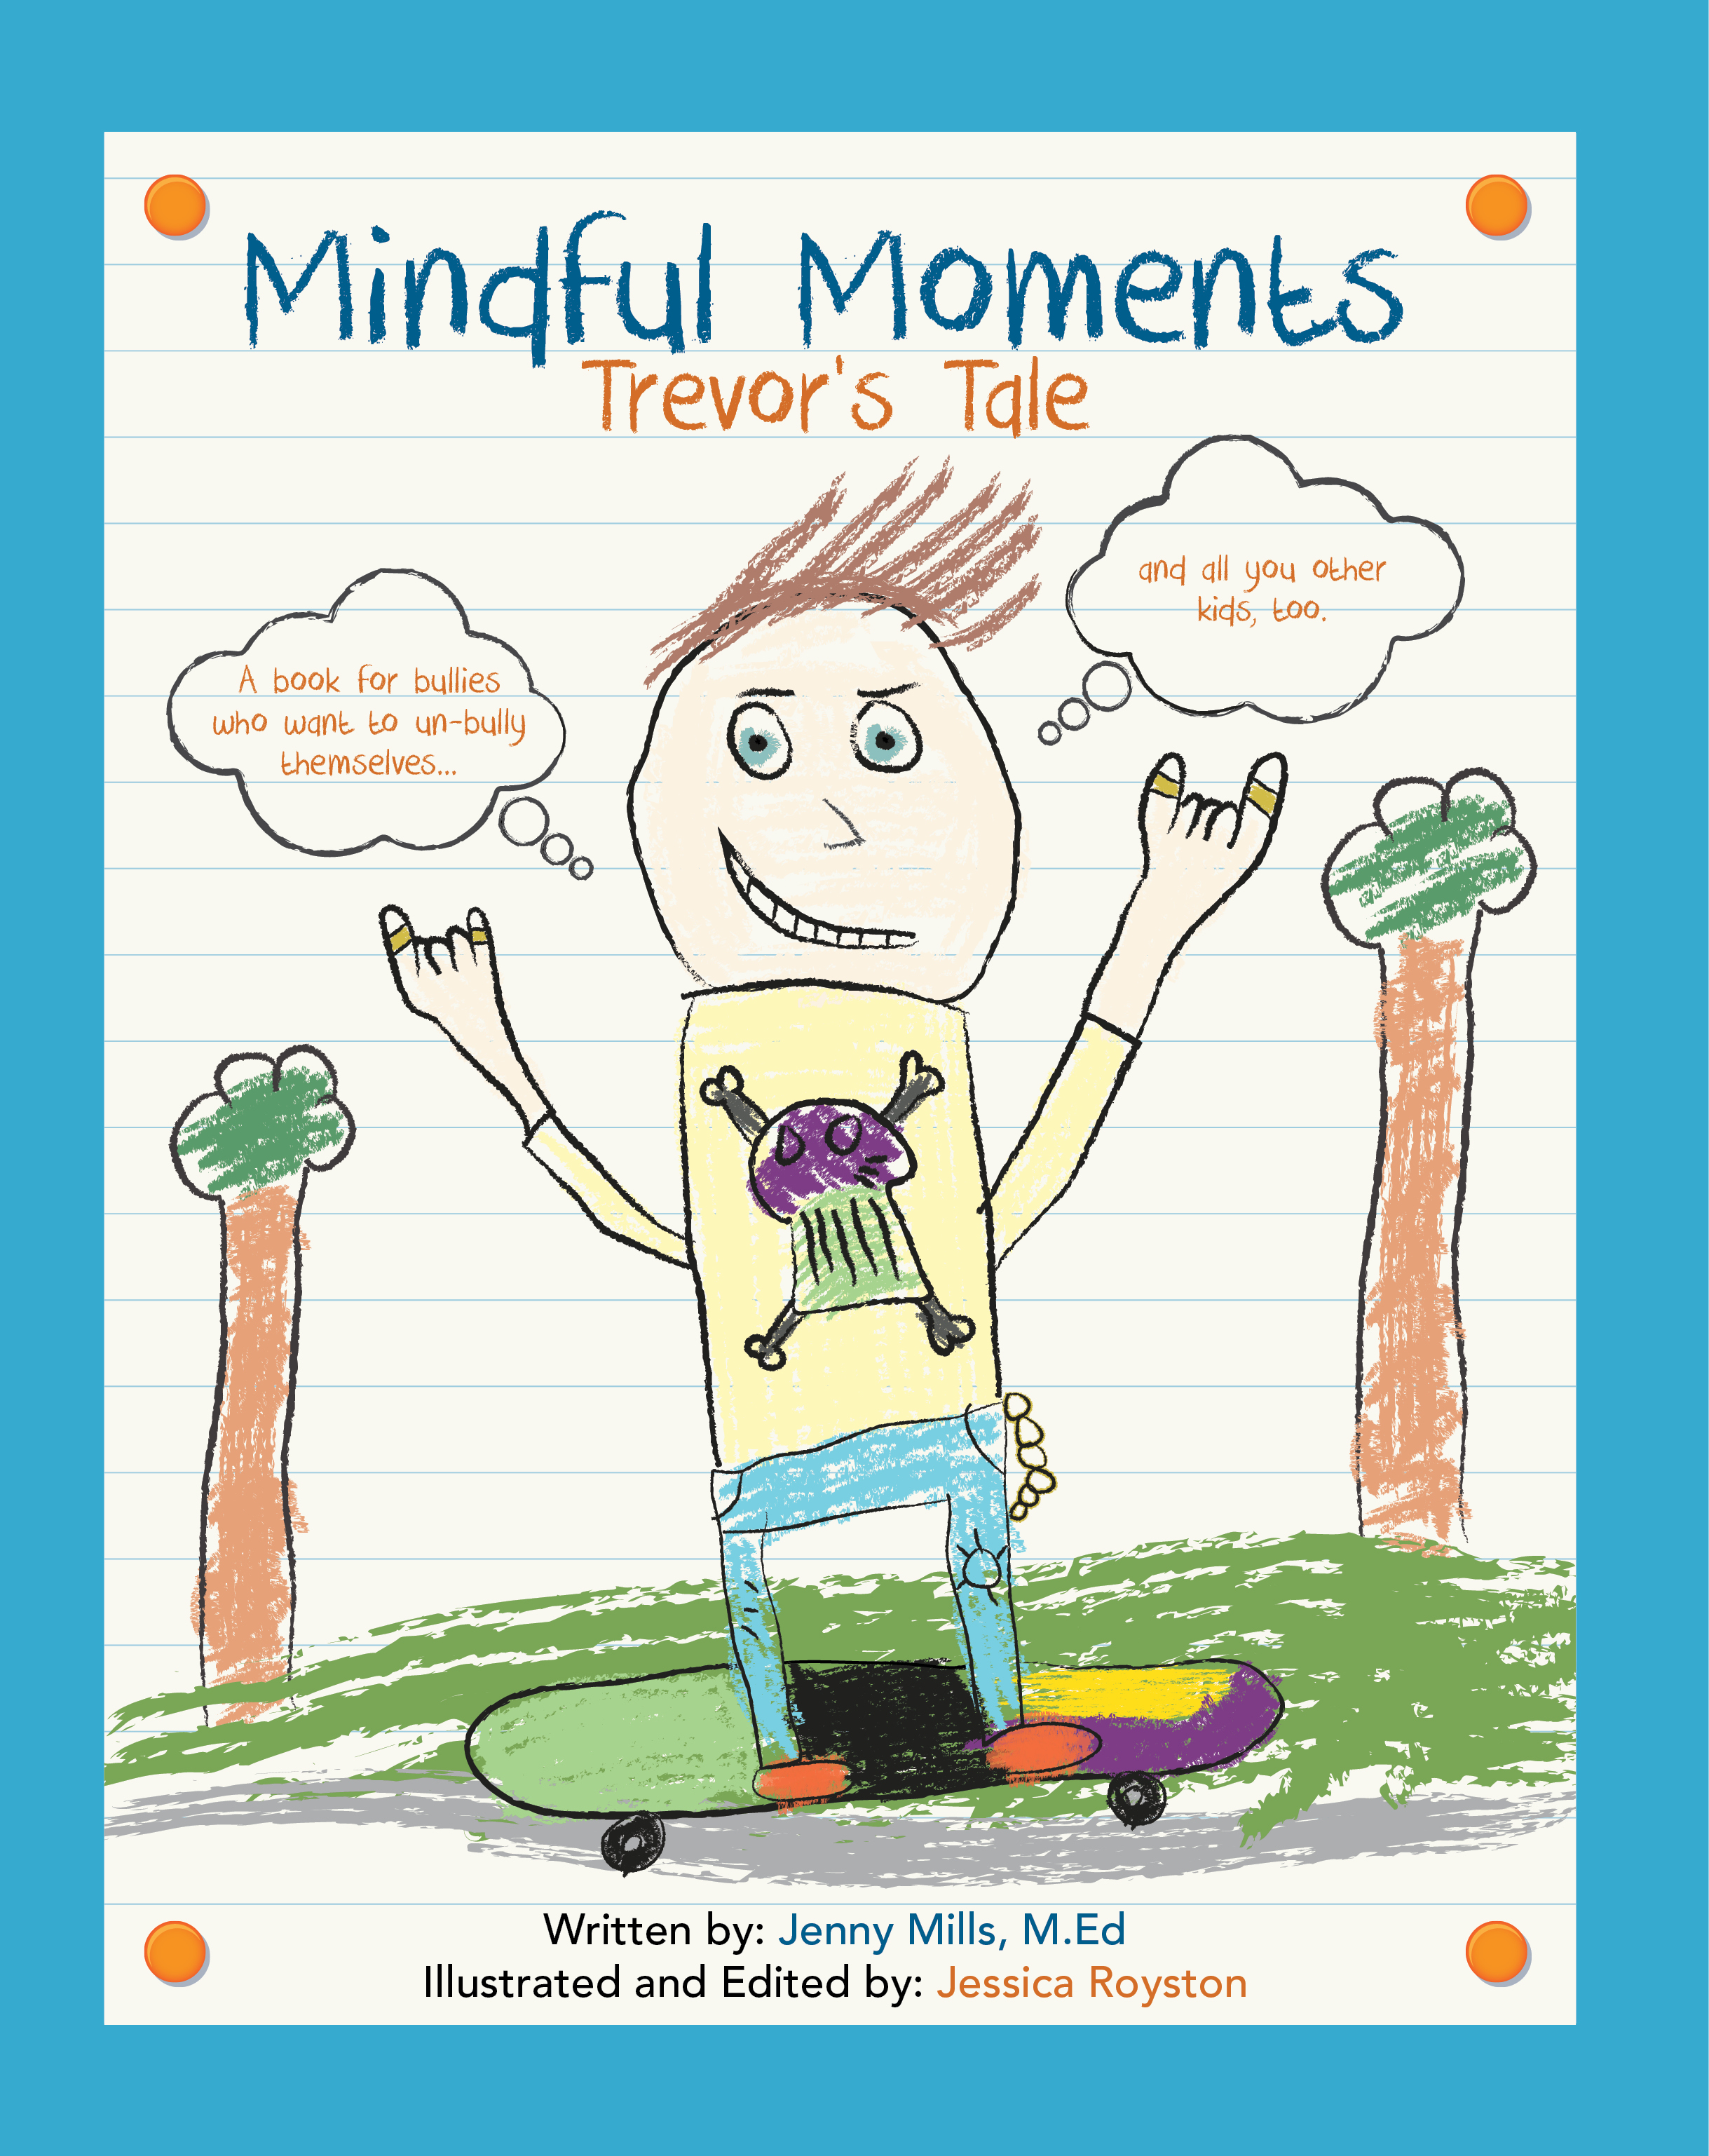 Mindful Moments: Trevor's Tale, an Ebook by Jenny Mills